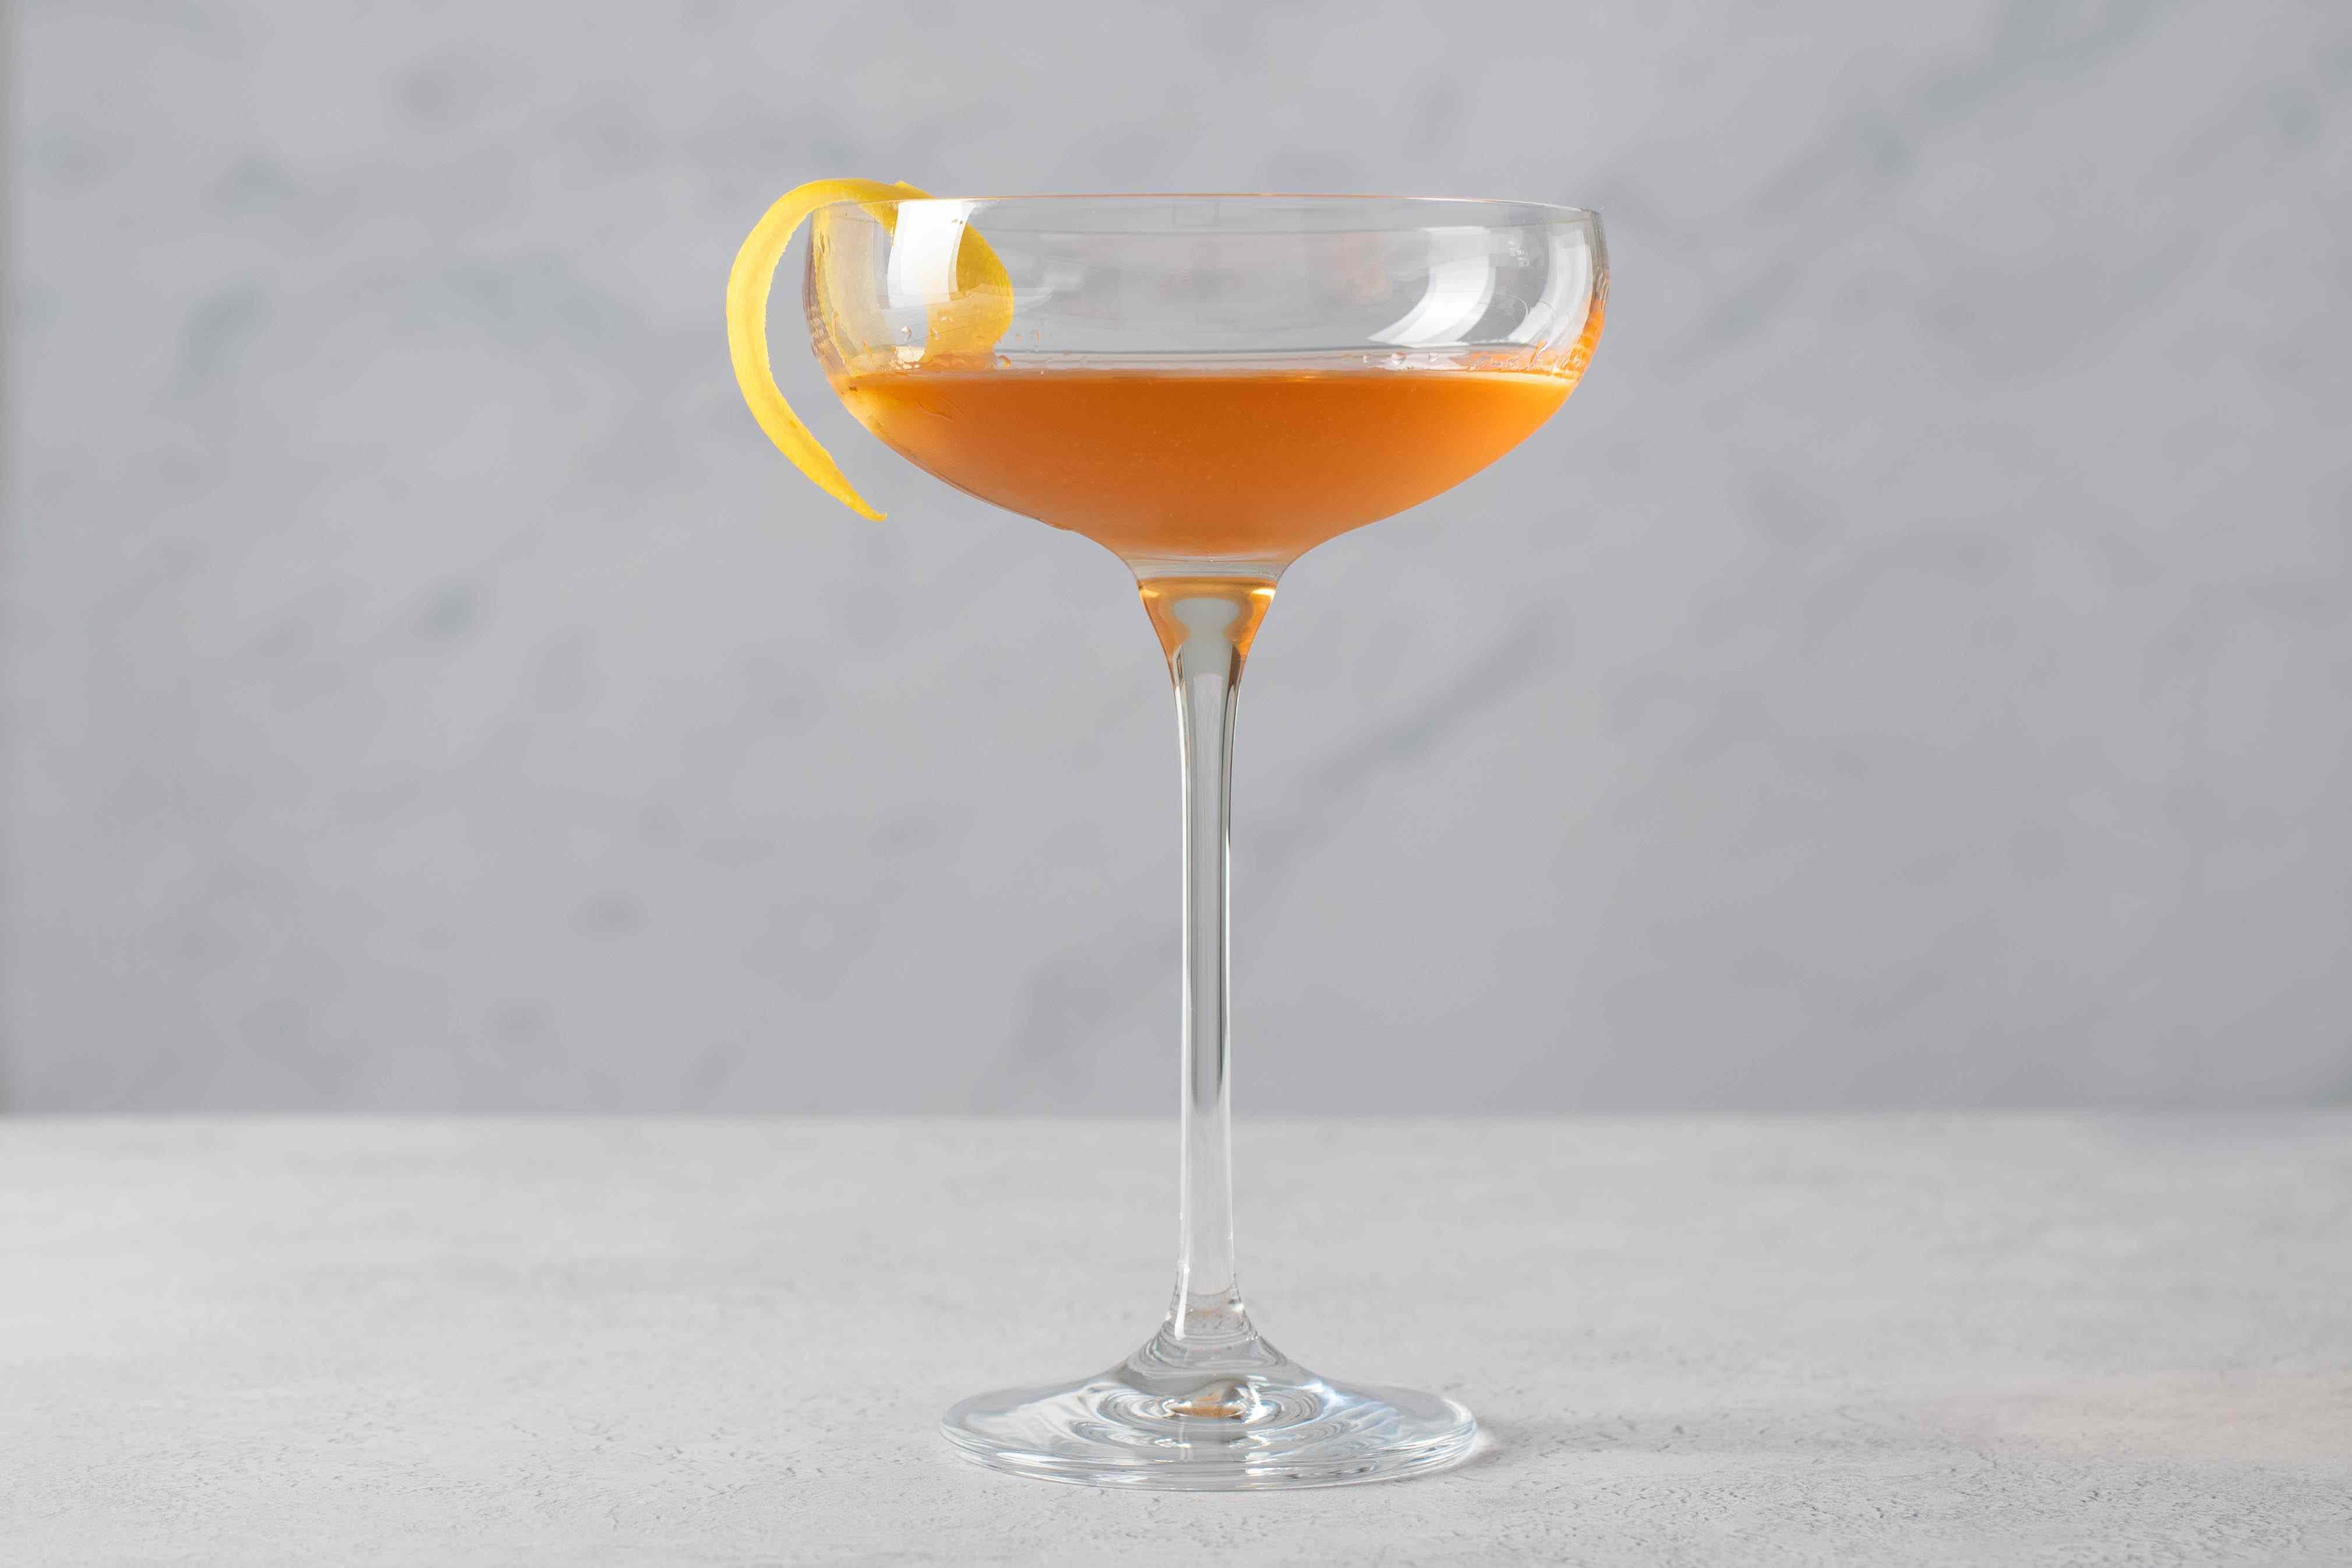 Pink Gin cocktail garnished with lemon twist